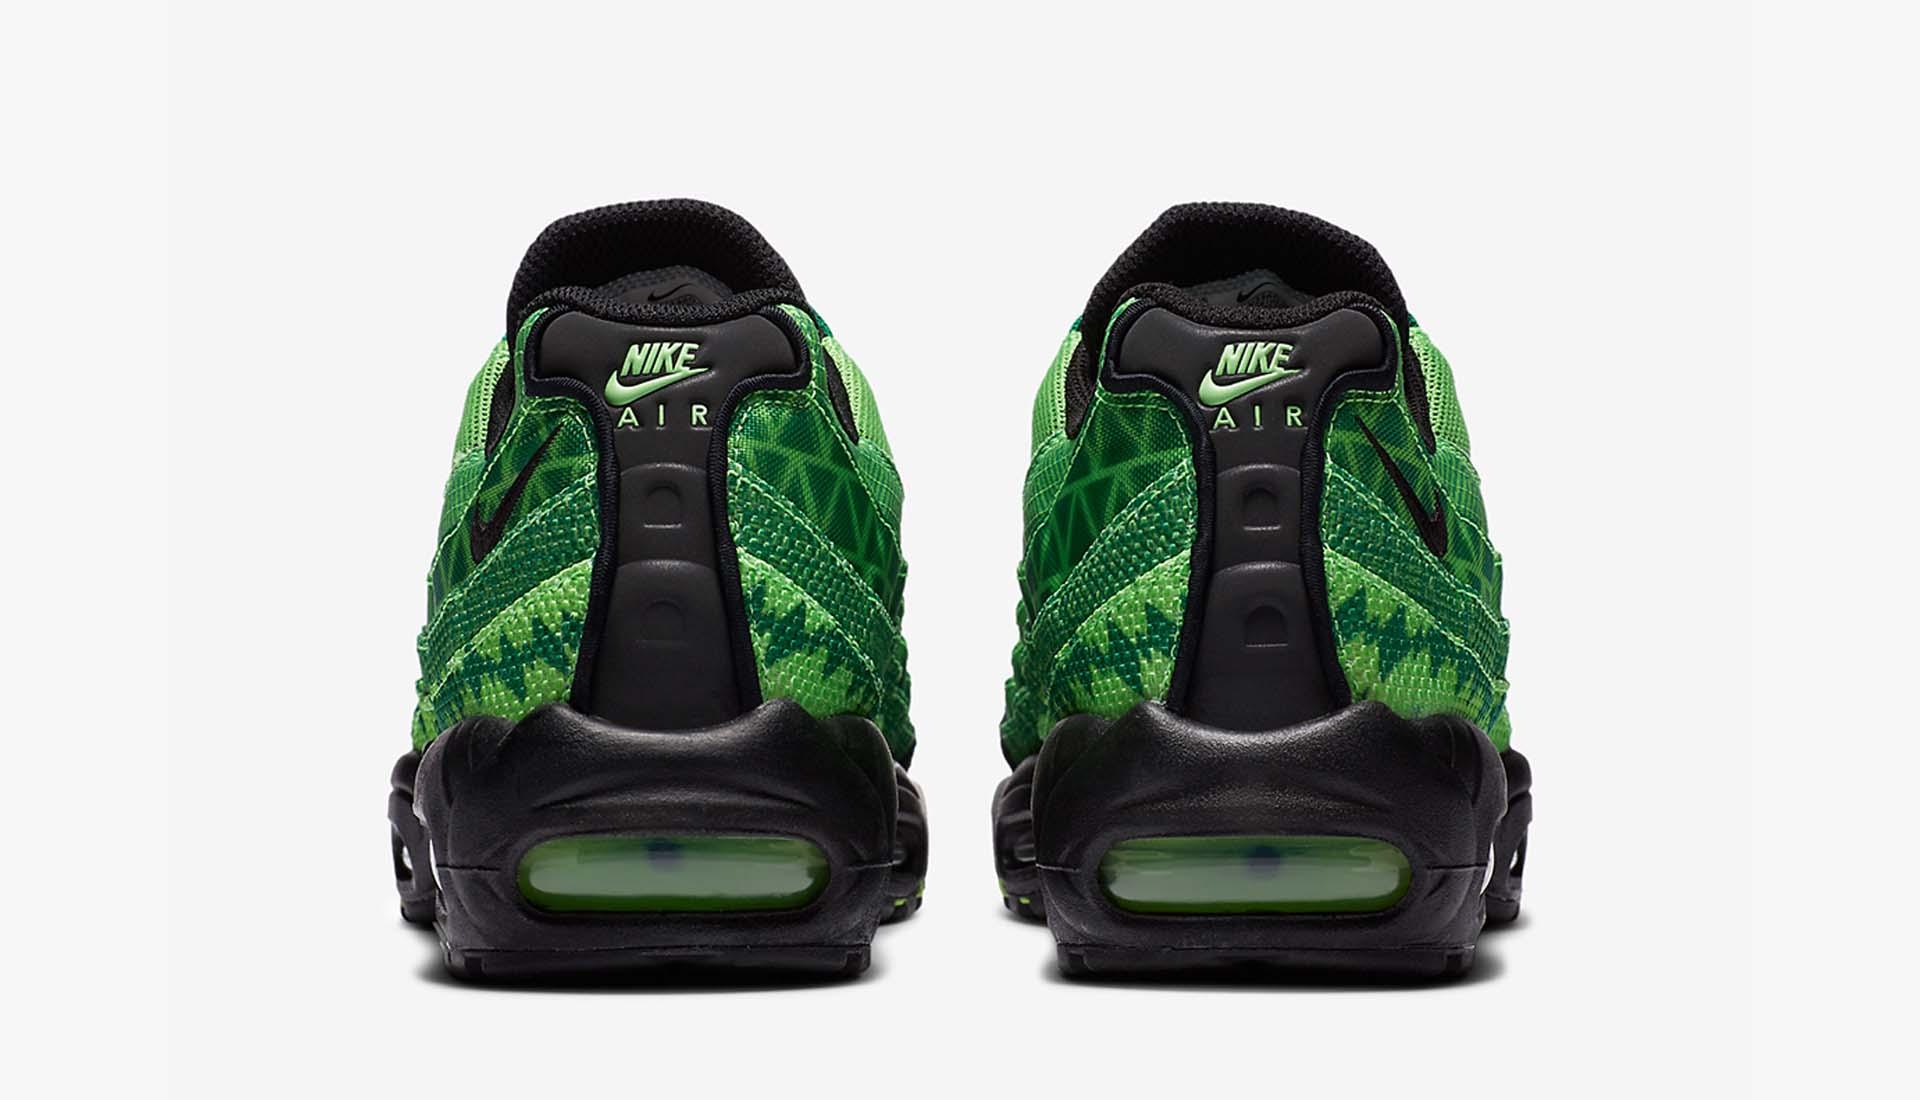 Nike Drop The Air Max 95 'Naija' - SoccerBible